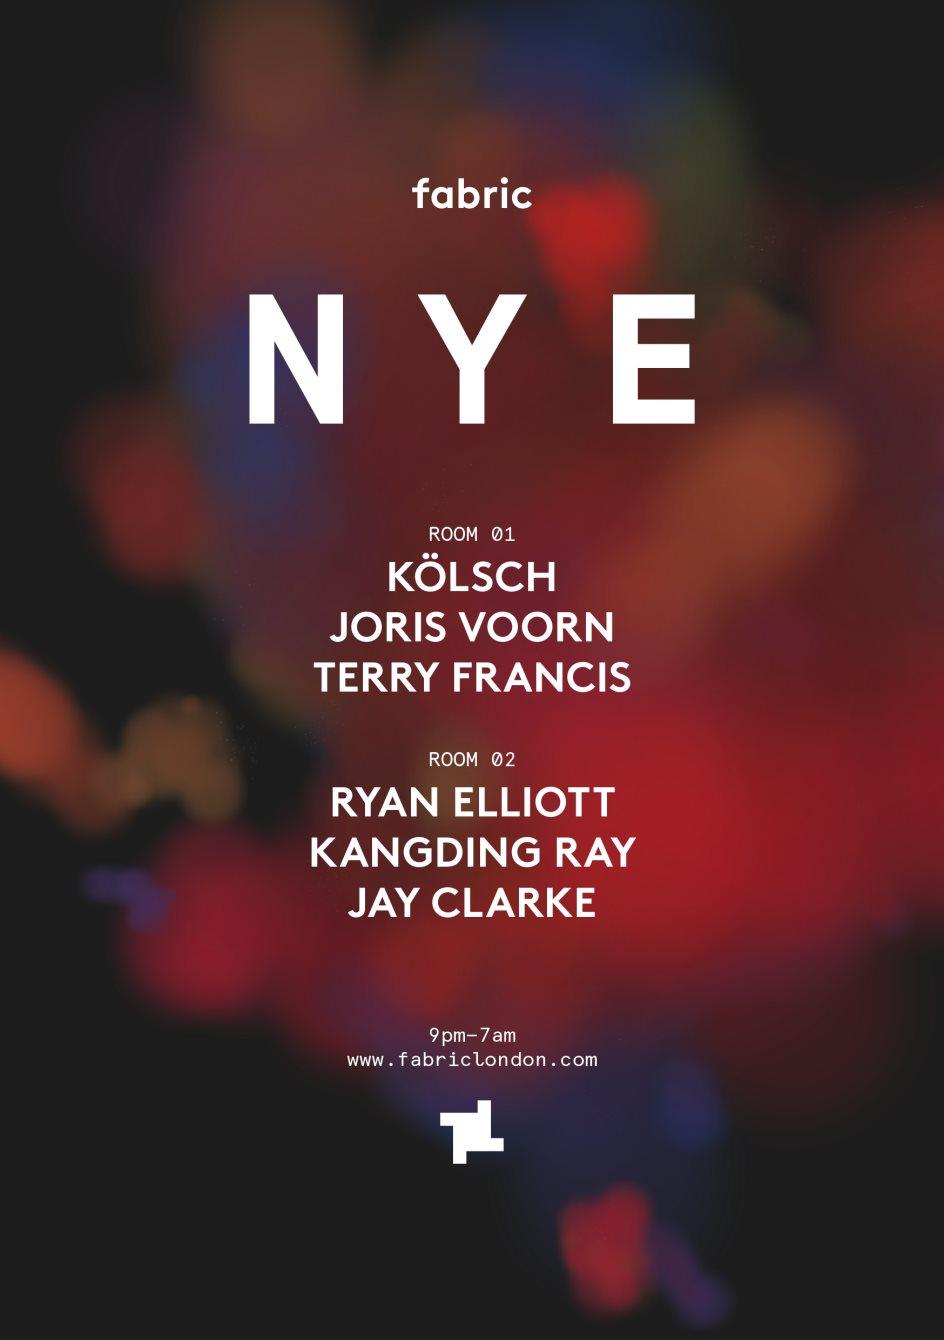 fabric NYE 2019: Kölsch, Joris Voorn & Ryan Elliott - Flyer back